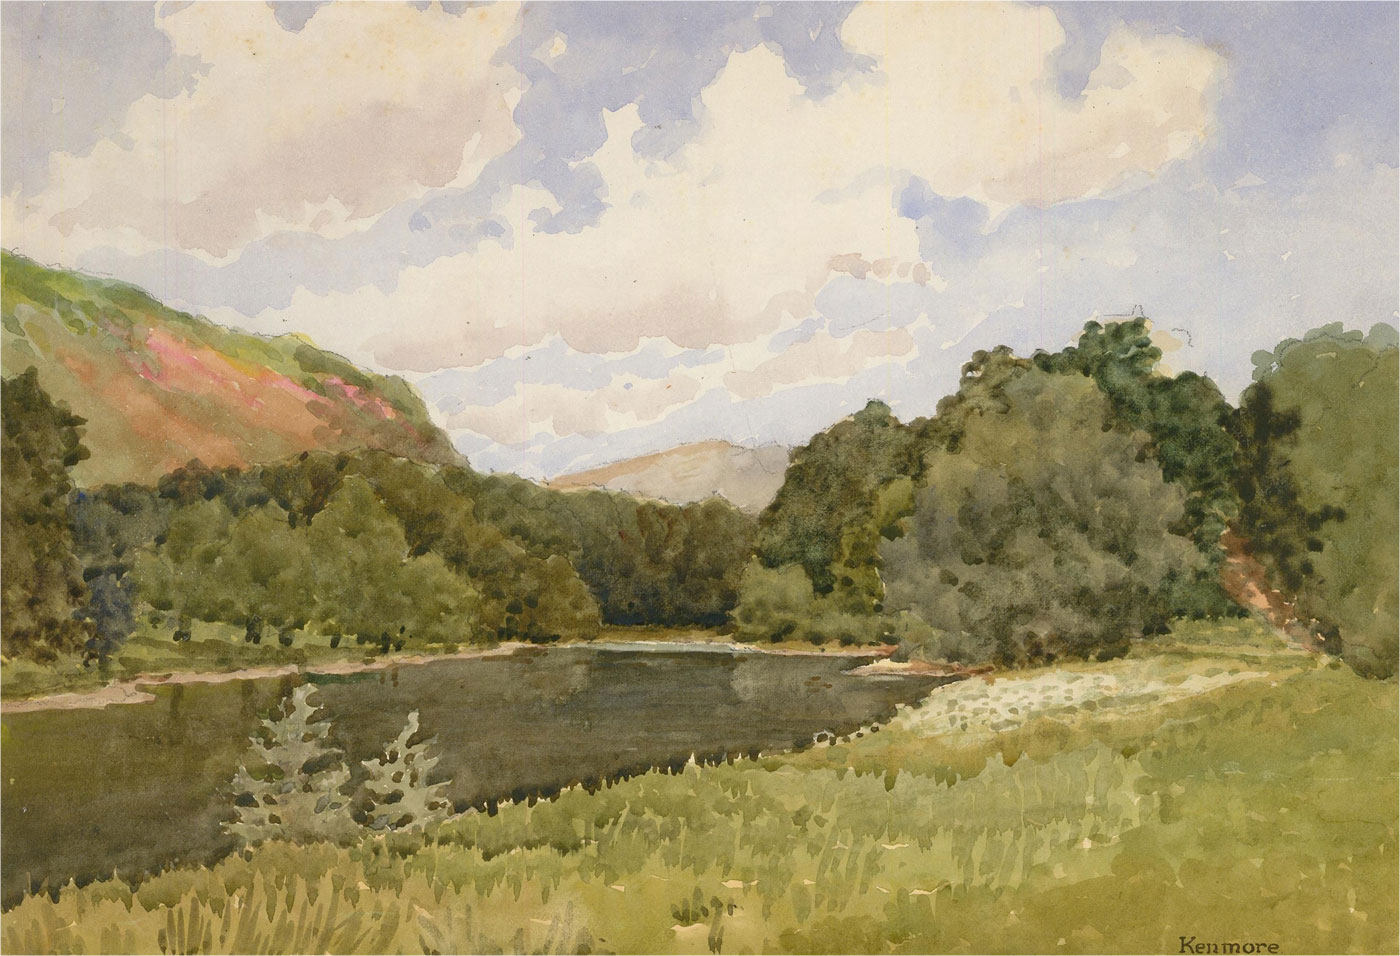 Raymond Turner Barker (1872-1945) - 1934 Watercolour, Kenmore